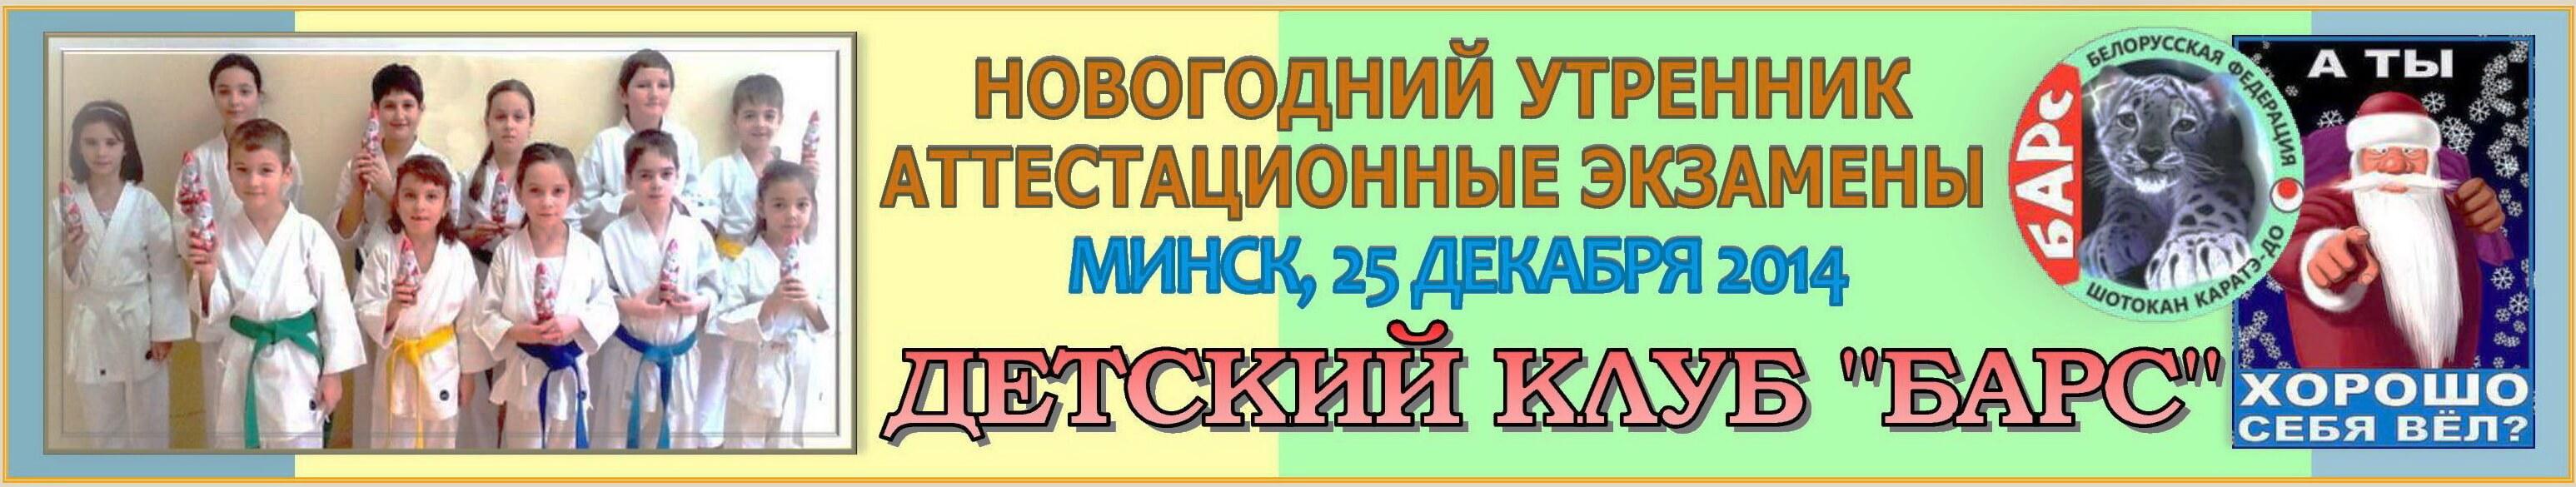 Барс 12-2014 Баннер